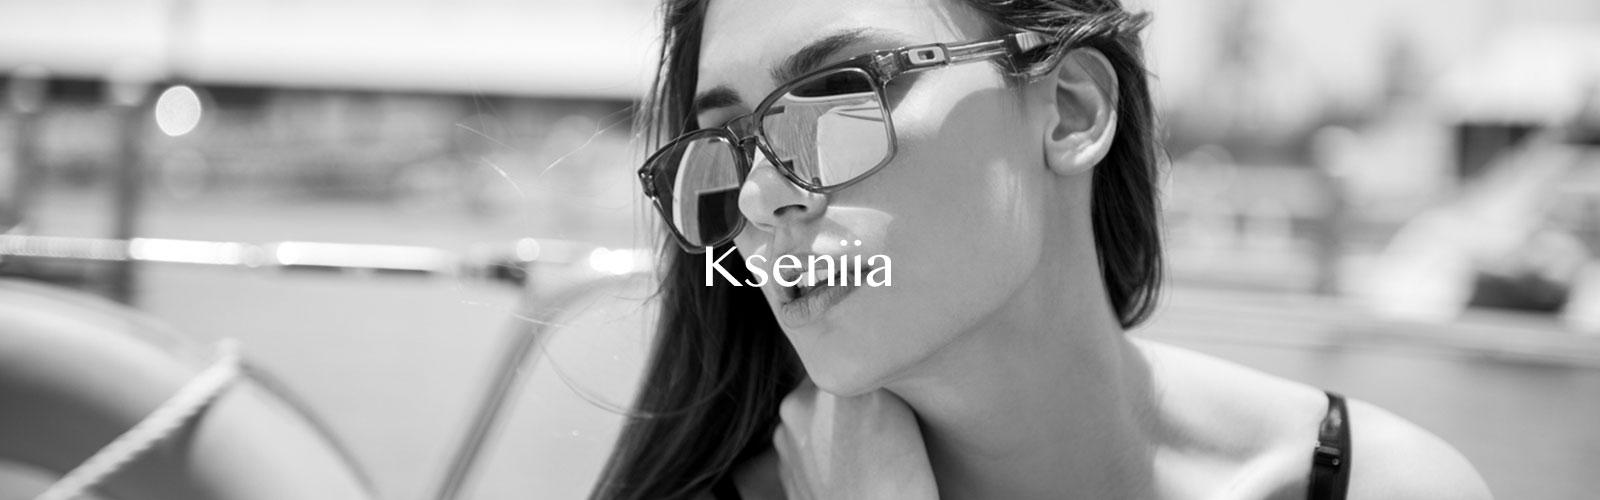 Kseniia-header-with-text